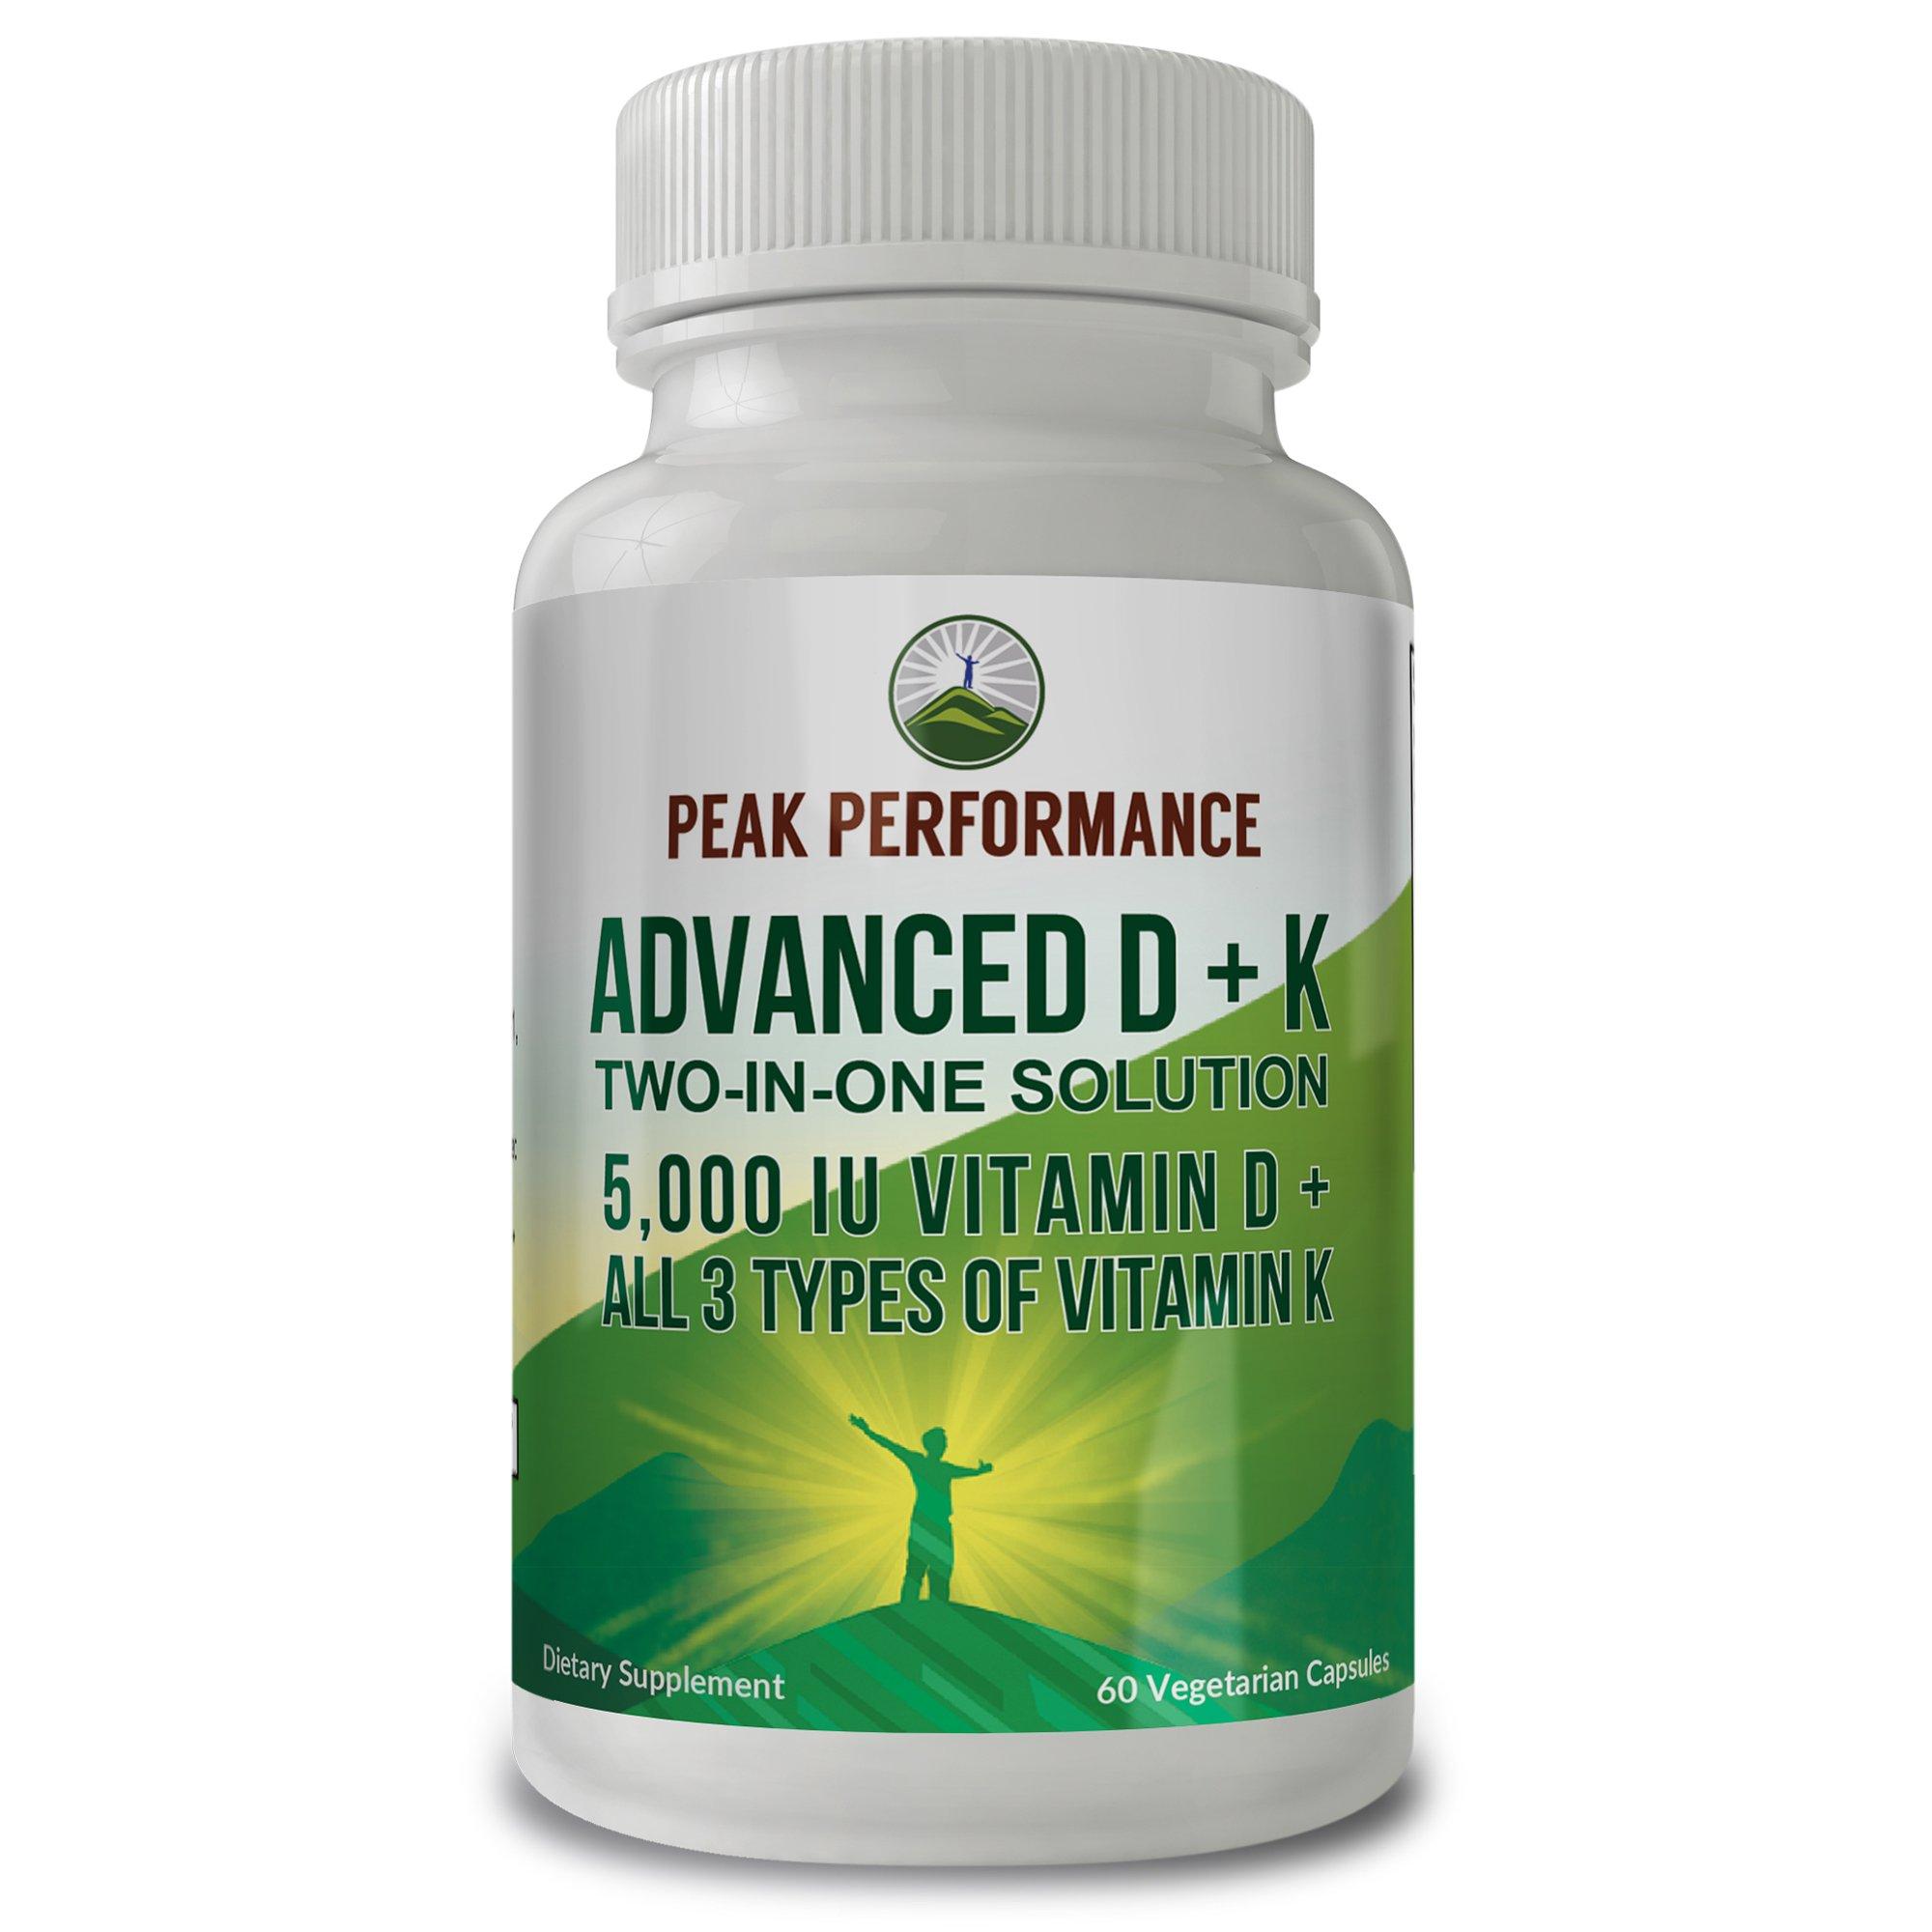 ADVANCED Vitamin D 5000 IU + ALL 3 Types Of Vitamin K By Peak Performance. Vitamin D3 and Vitamin K2 MK-7 (MK7) K2 MK4 K1 Supplement! 60 Small & Easy to Swallow Vegetable Capsules / Pills (5000 IU)